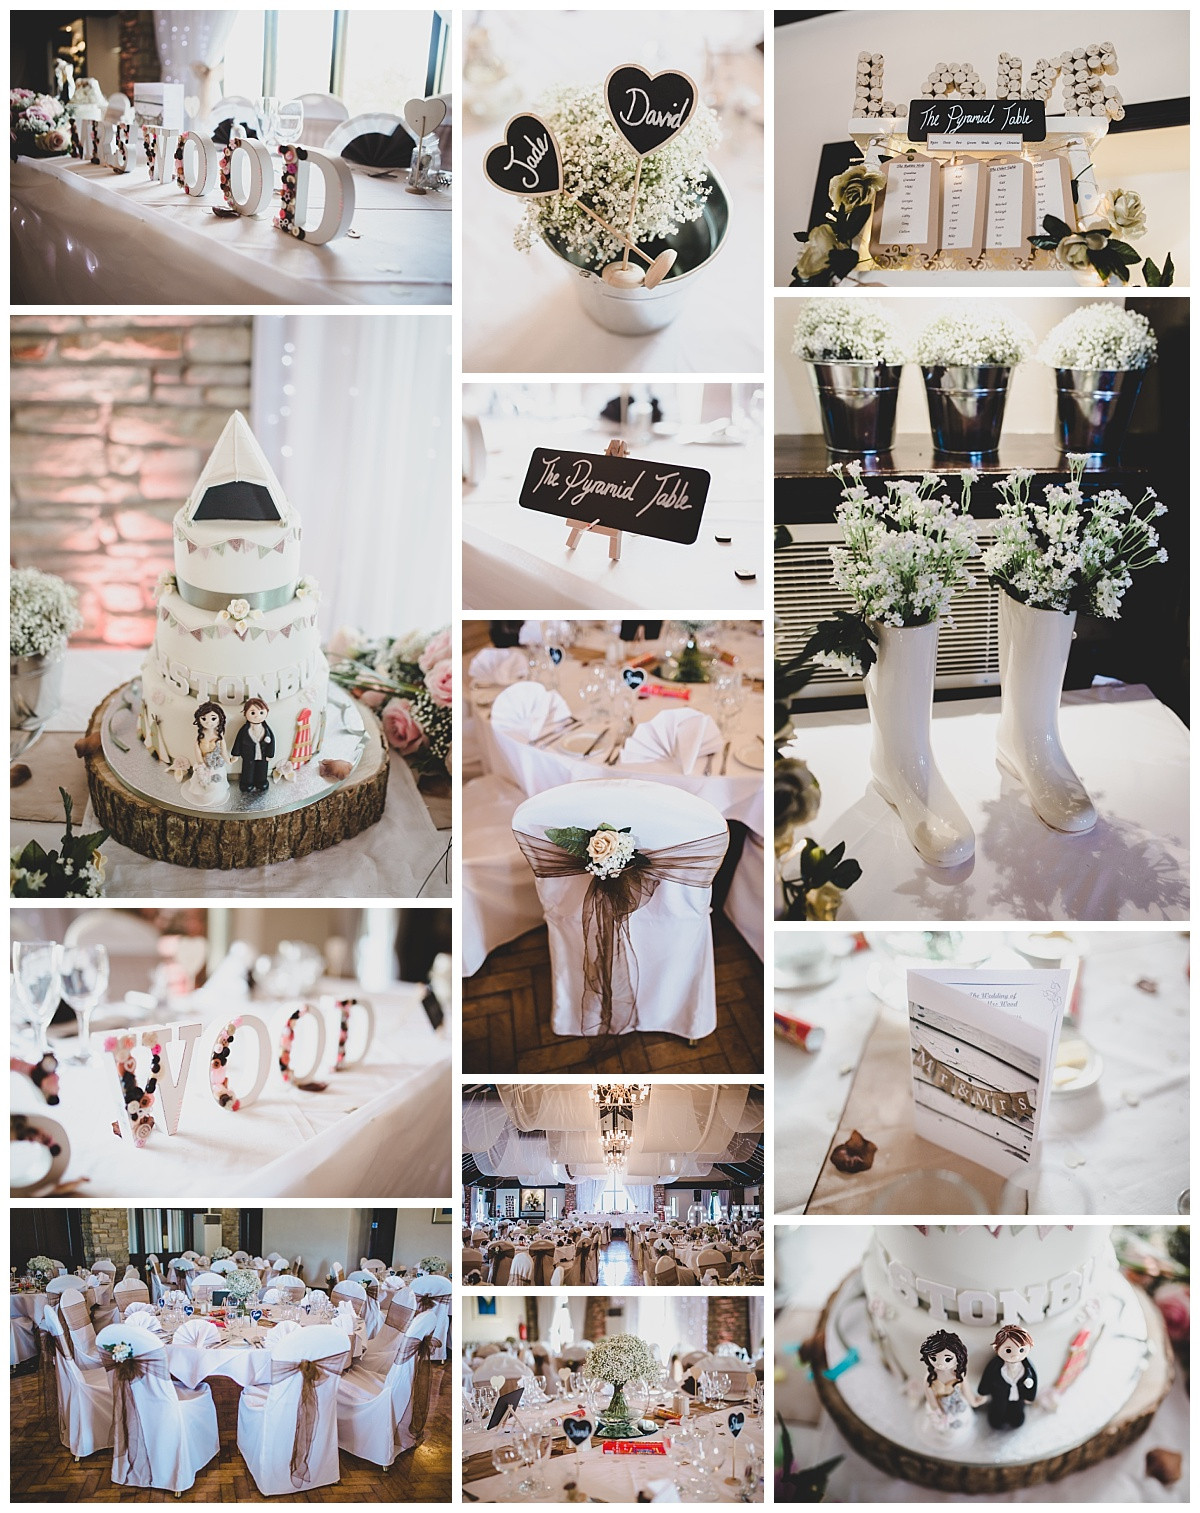 festival themed wedding - the table settings